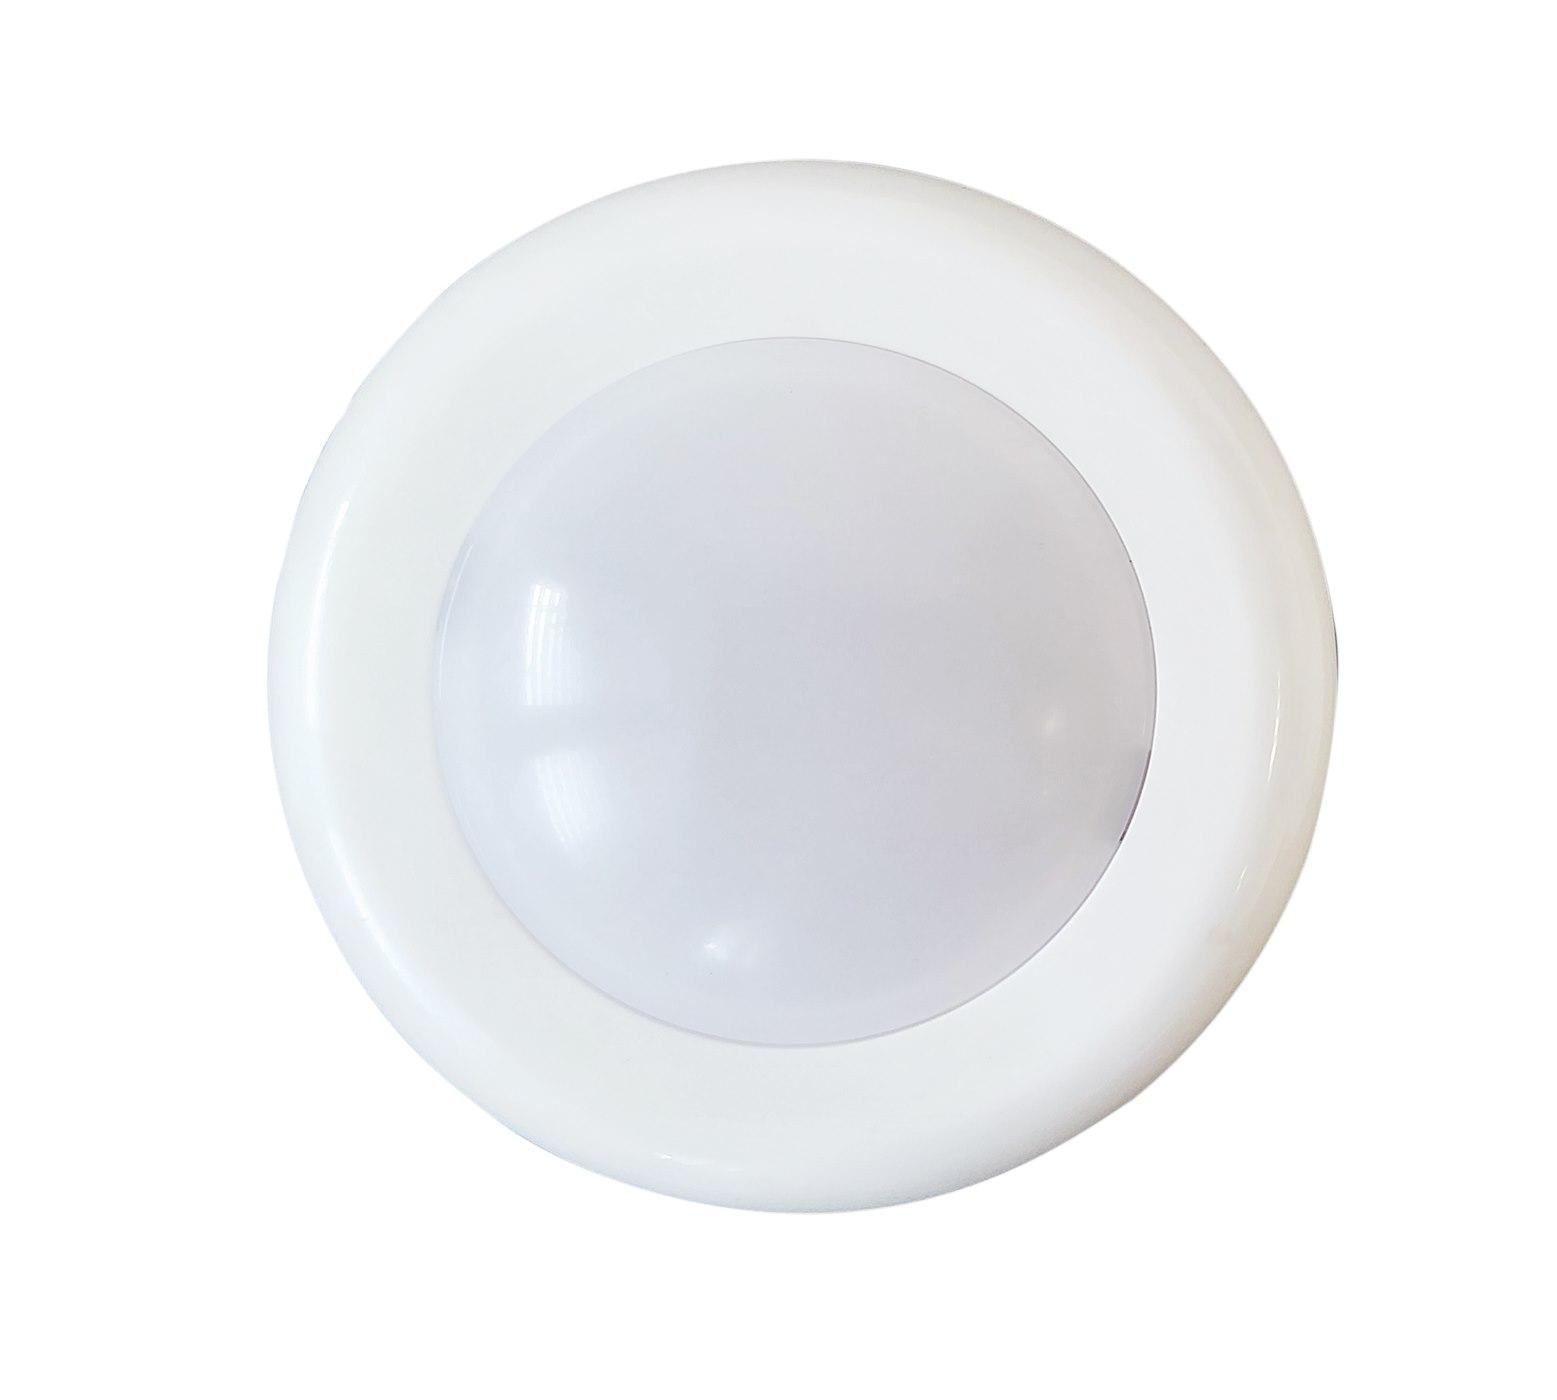 Greenlux LED POINT RGB RC - SET 4pcs GXLS239